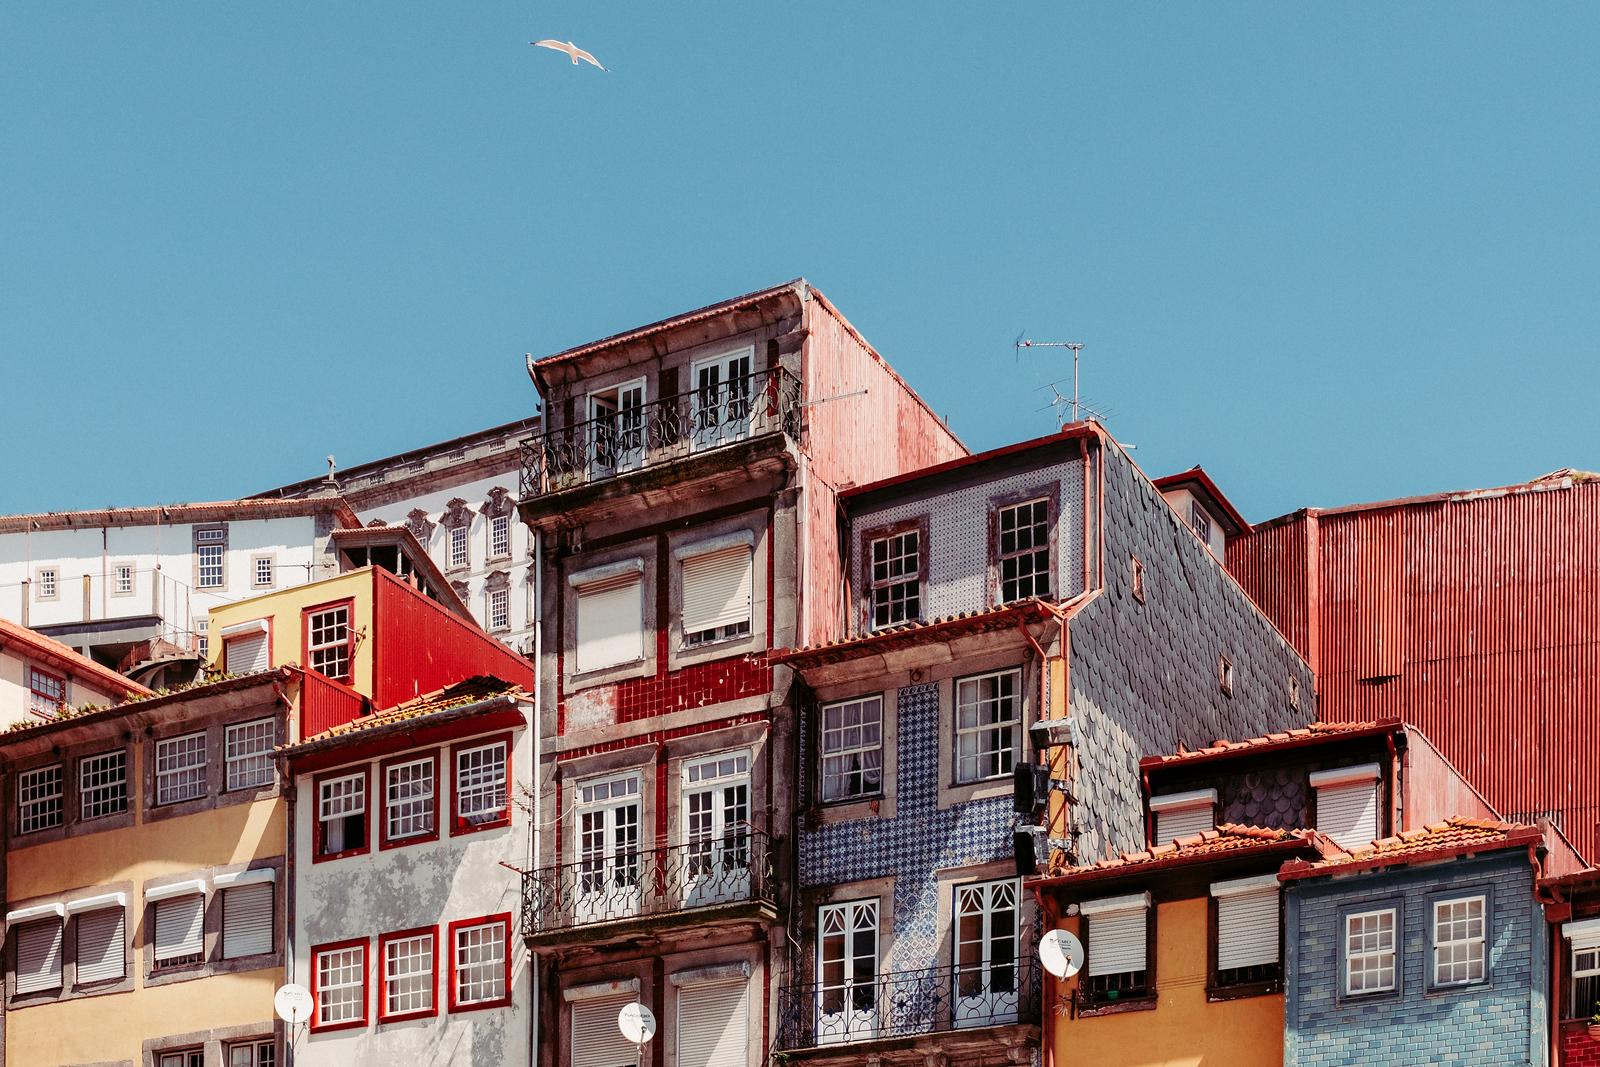 Buildings around the Port of Ribeira Square in Porto